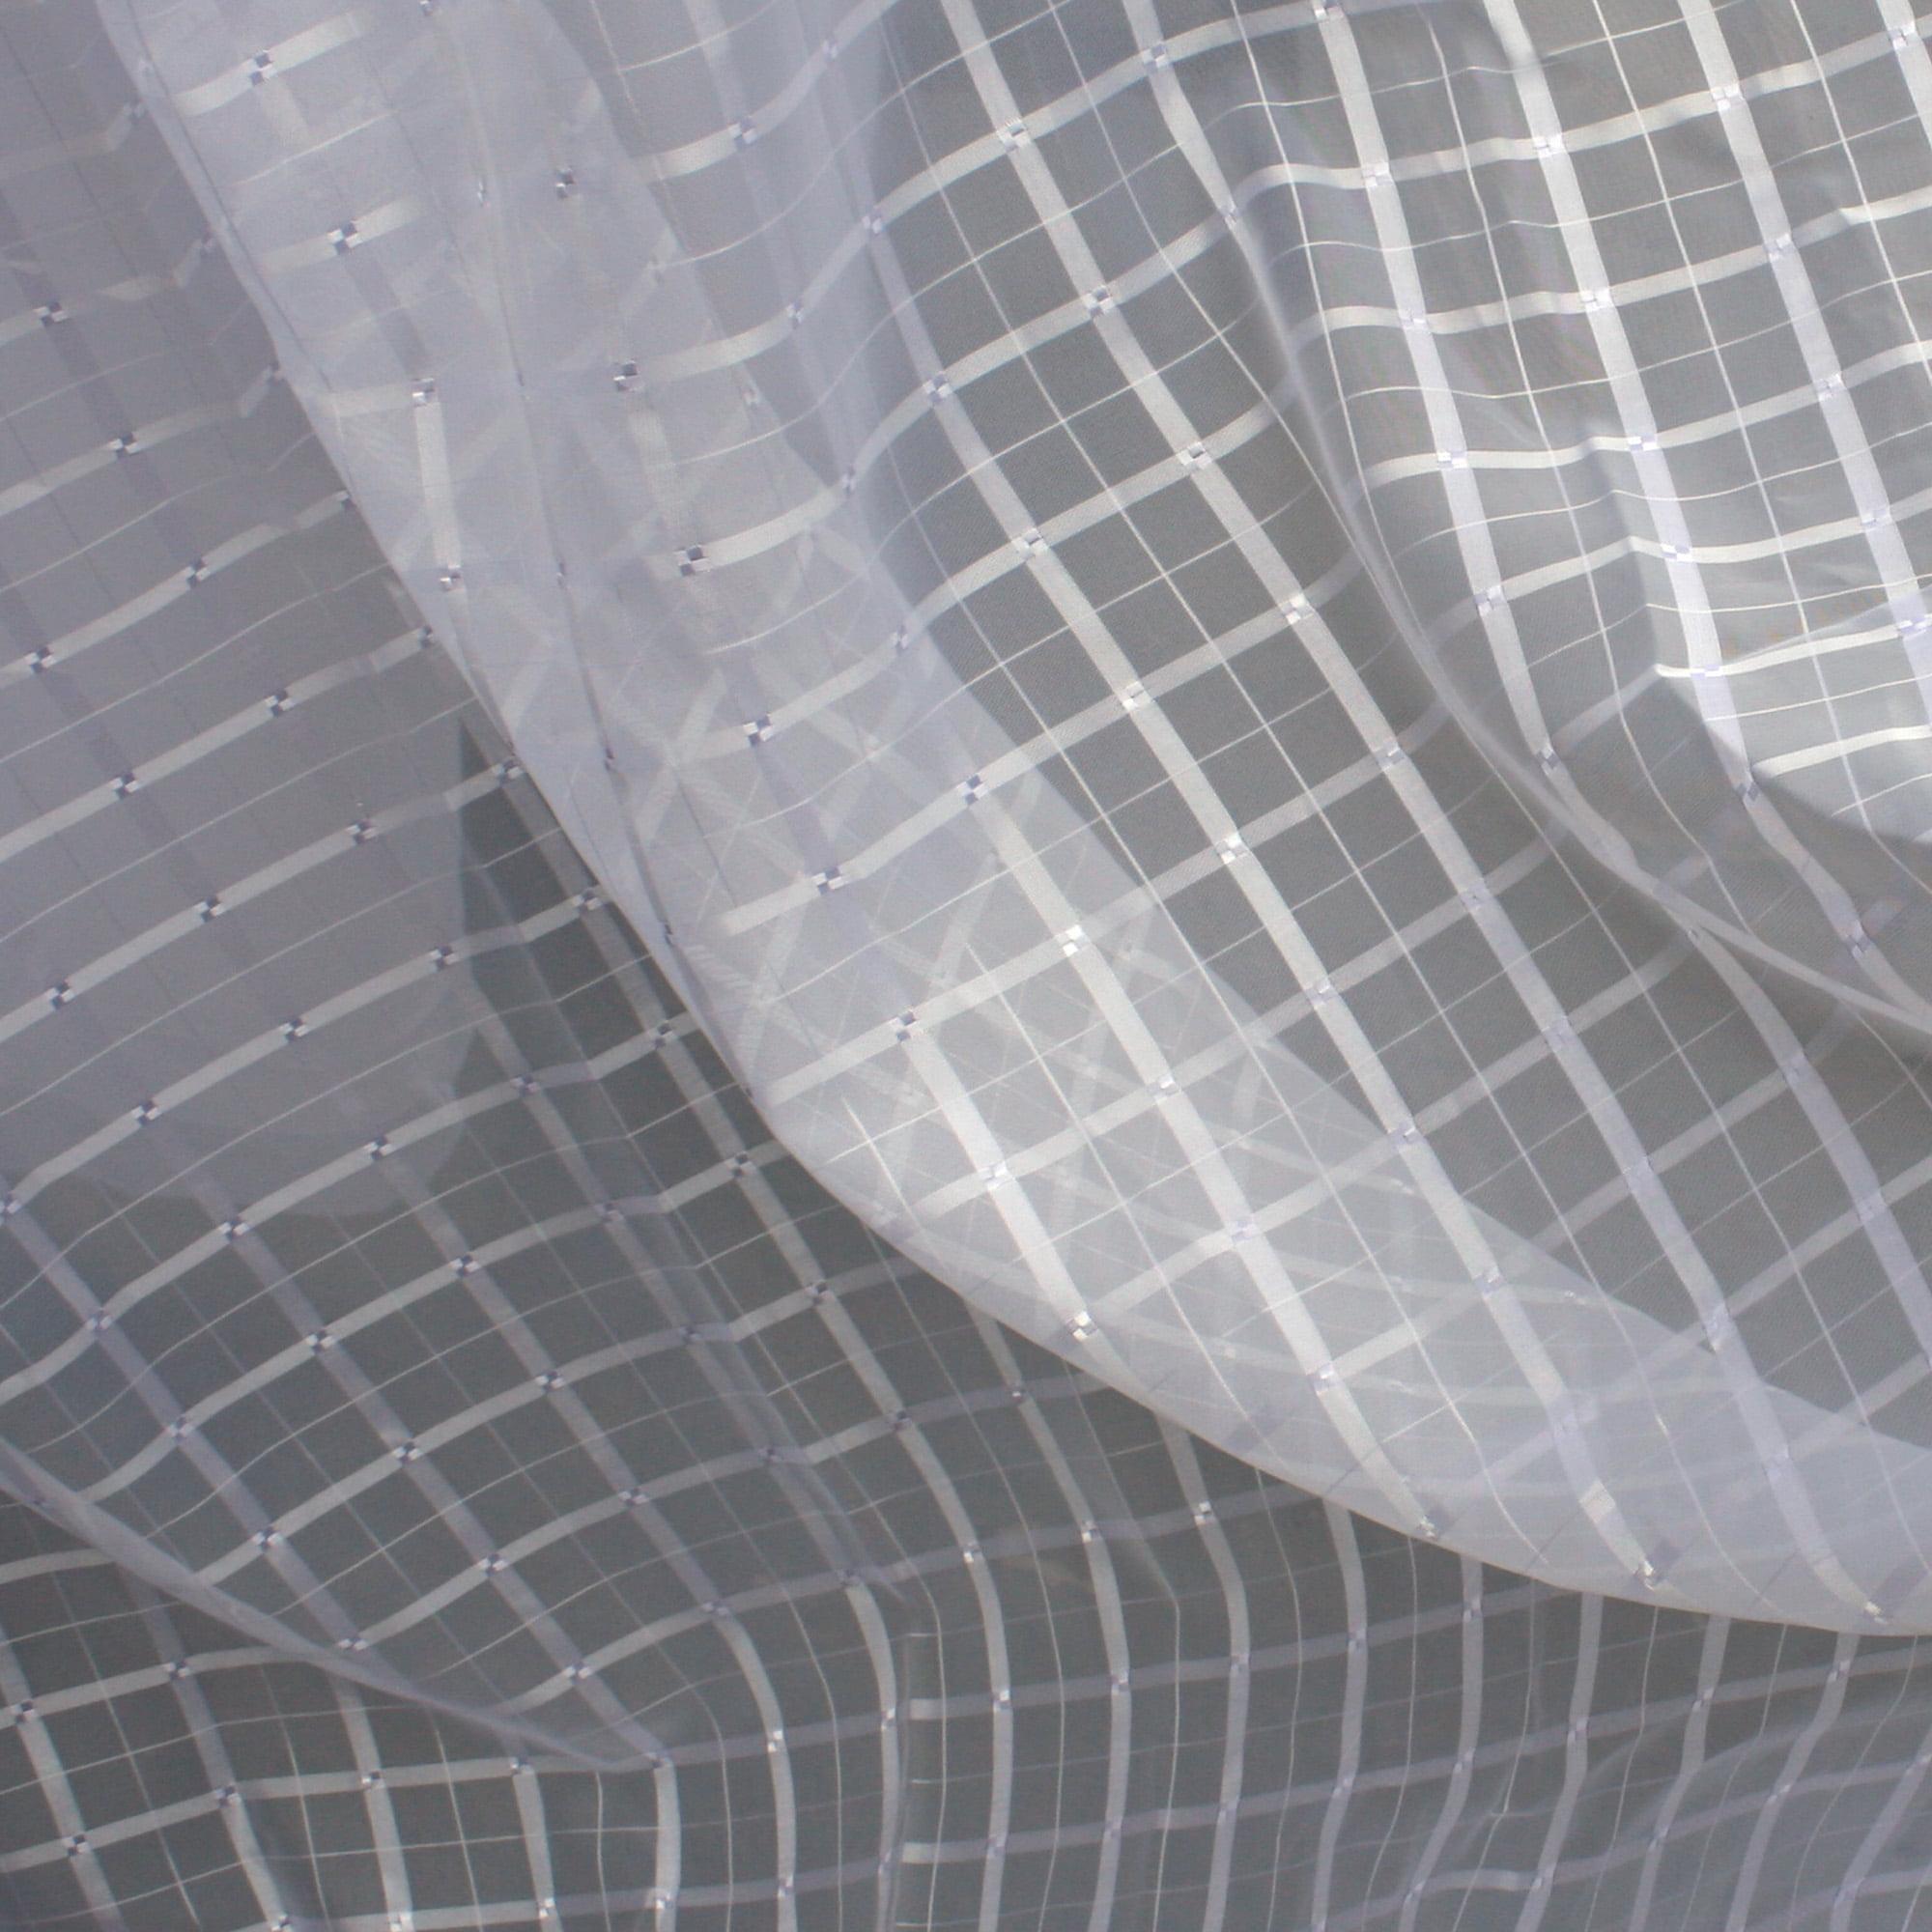 Cortina de Voil Xadrez Branco com forro Microfibra Branco 8,00 x 2,70 - Para varão Simples com ilhós Branco (H)